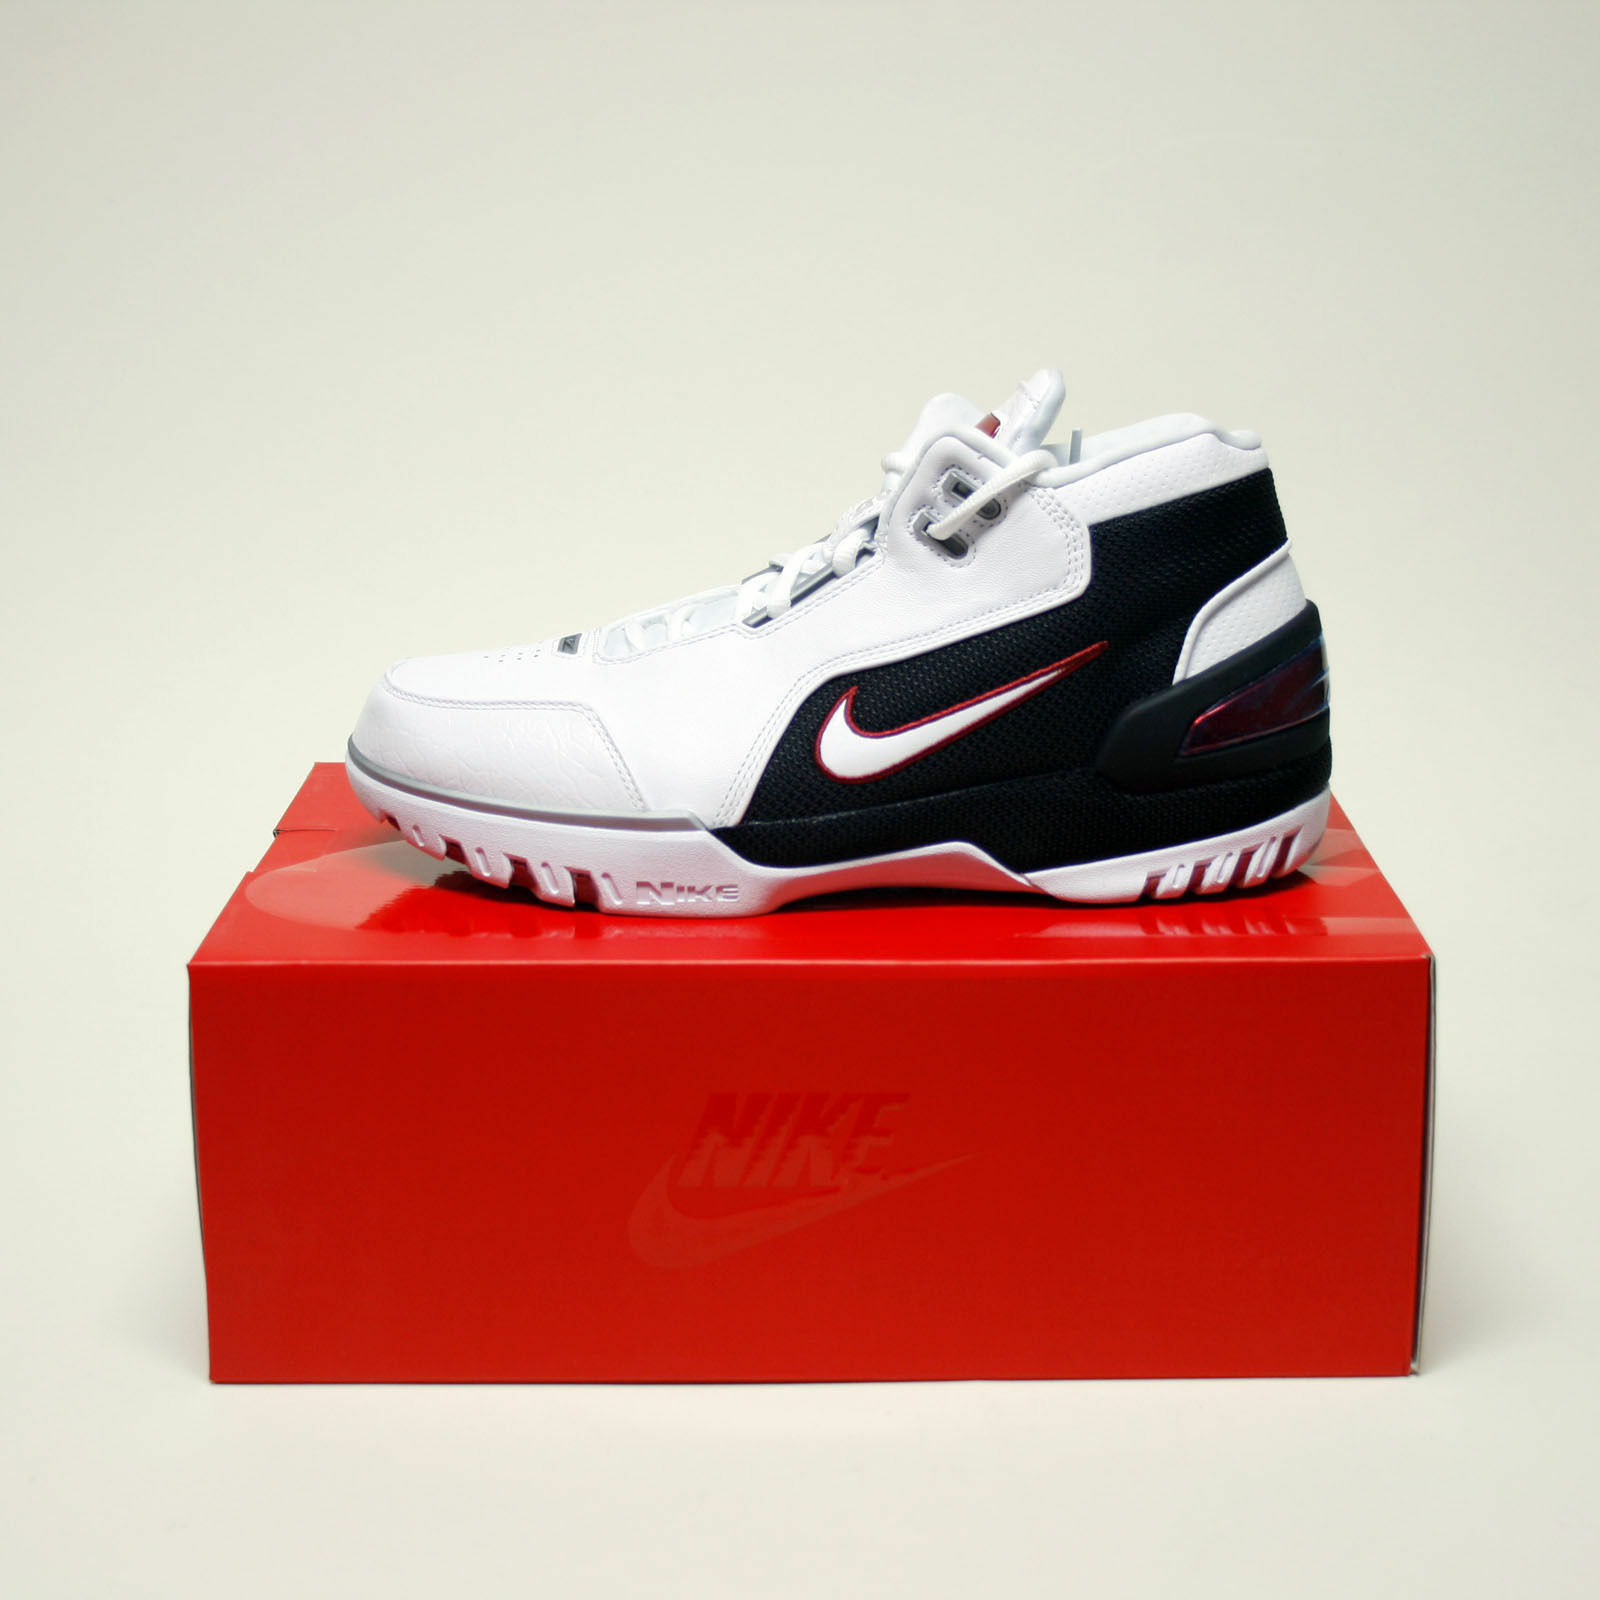 Nike Air Zoom Generation QS KINGS FIRST GAME AJ4204-101 LEBRON JAMES SZ 8